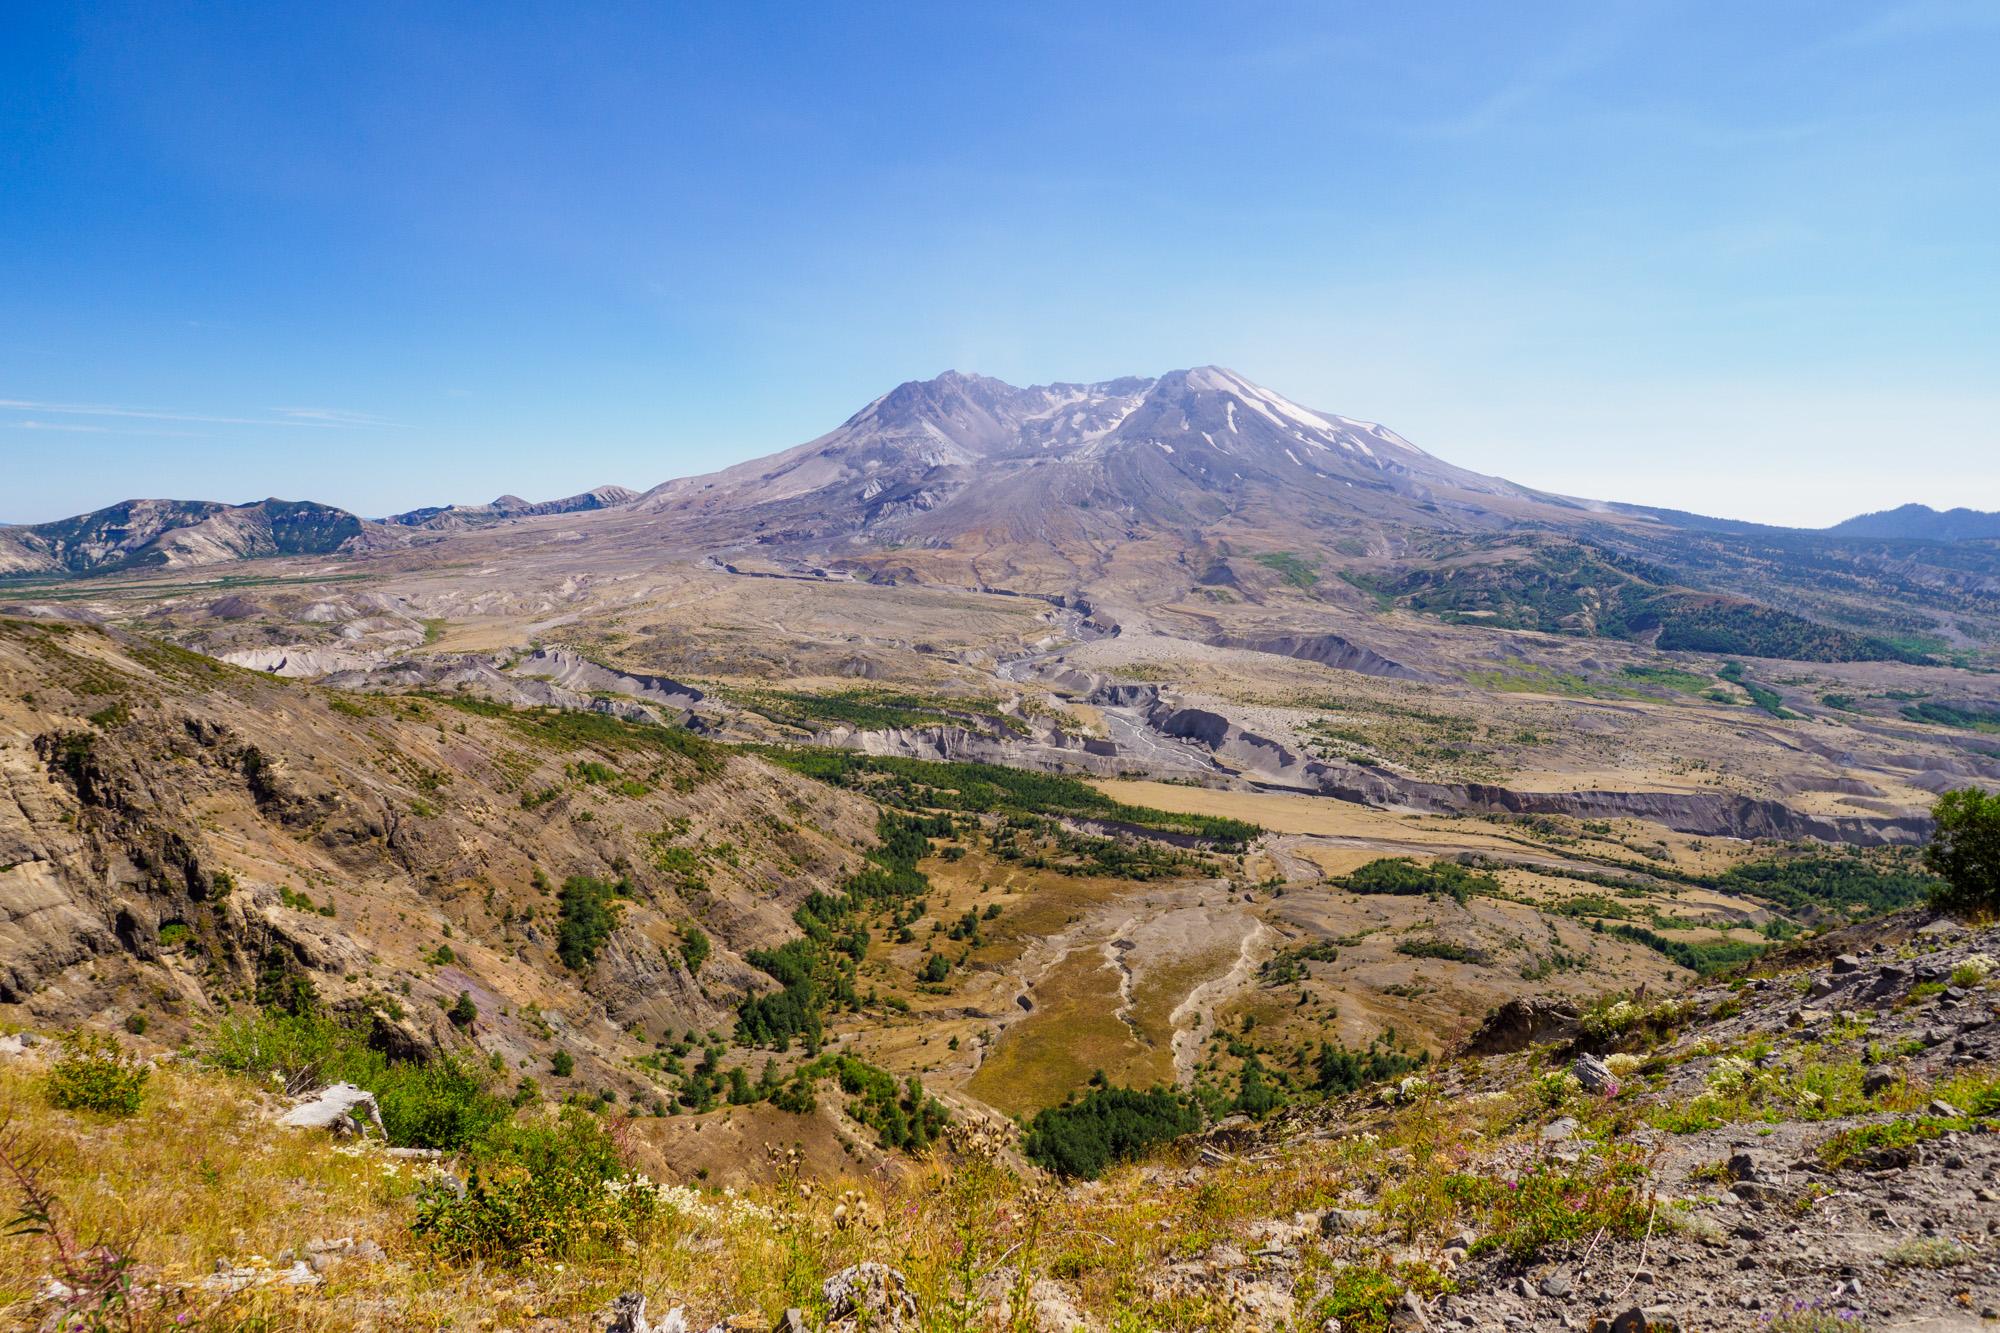 Mt St Helens - Mt St Helens